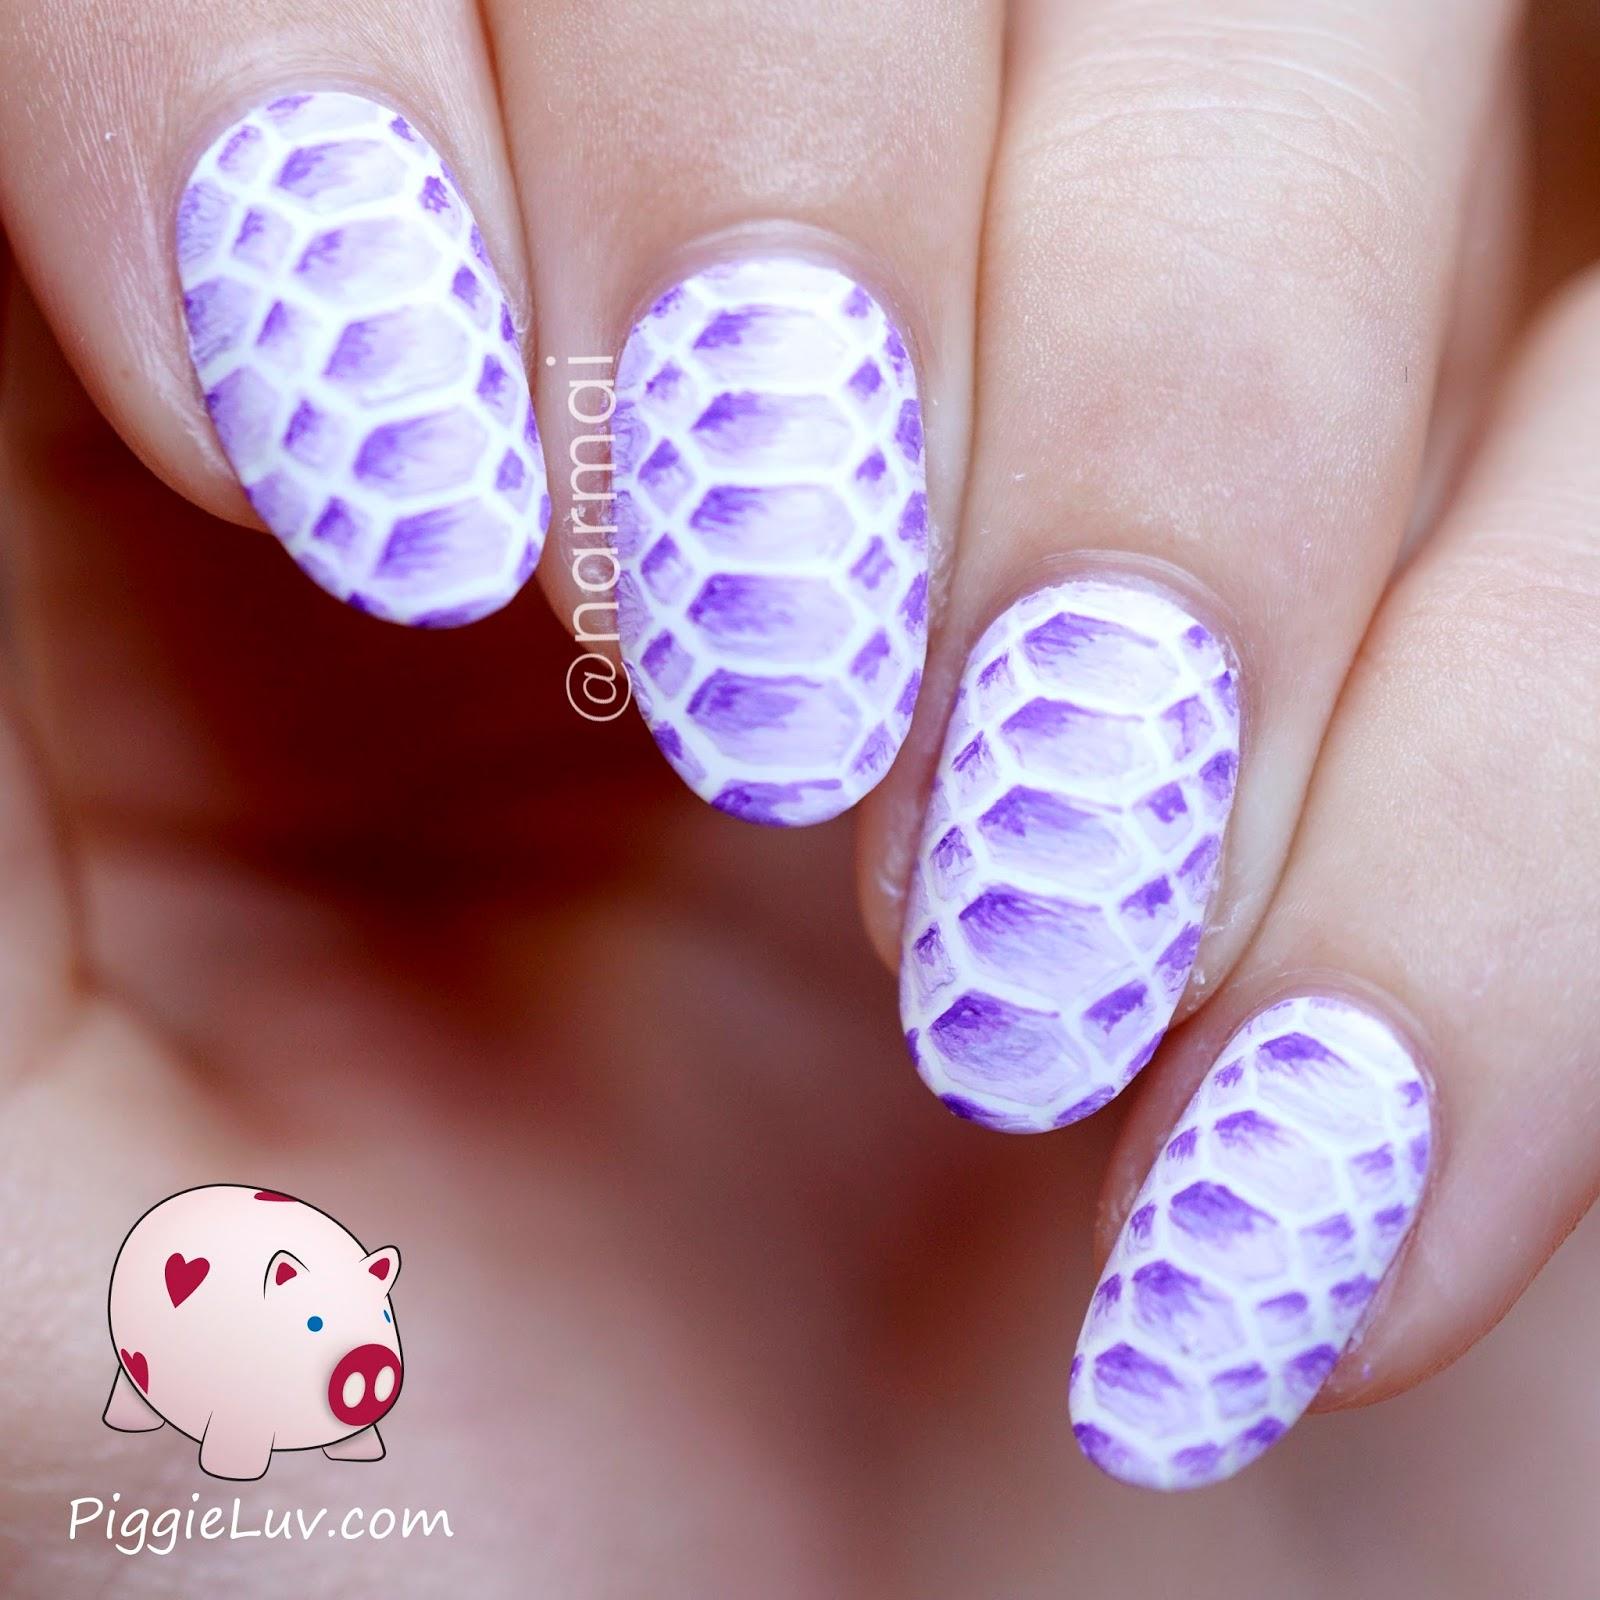 Piggieluv Freehand Purple Snake Skin Nail Art